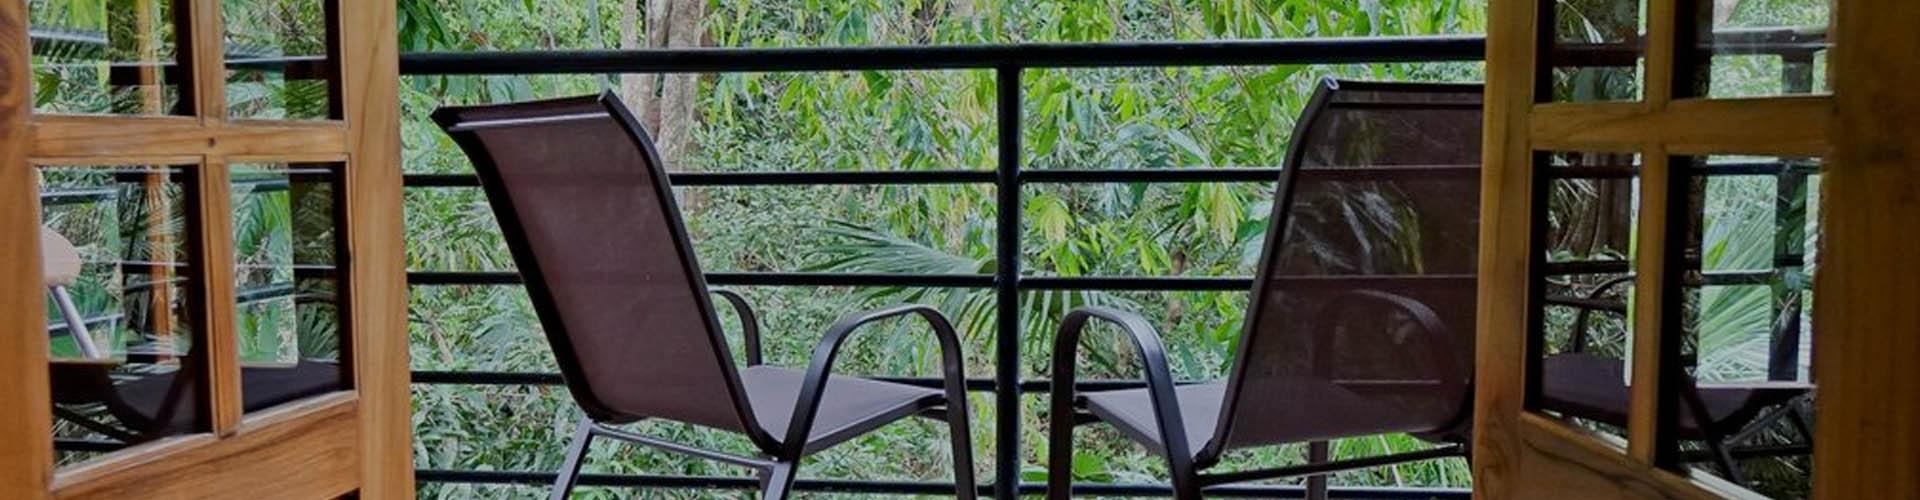 Jungle Vista Inn (@jungle-vistainn) Cover Image